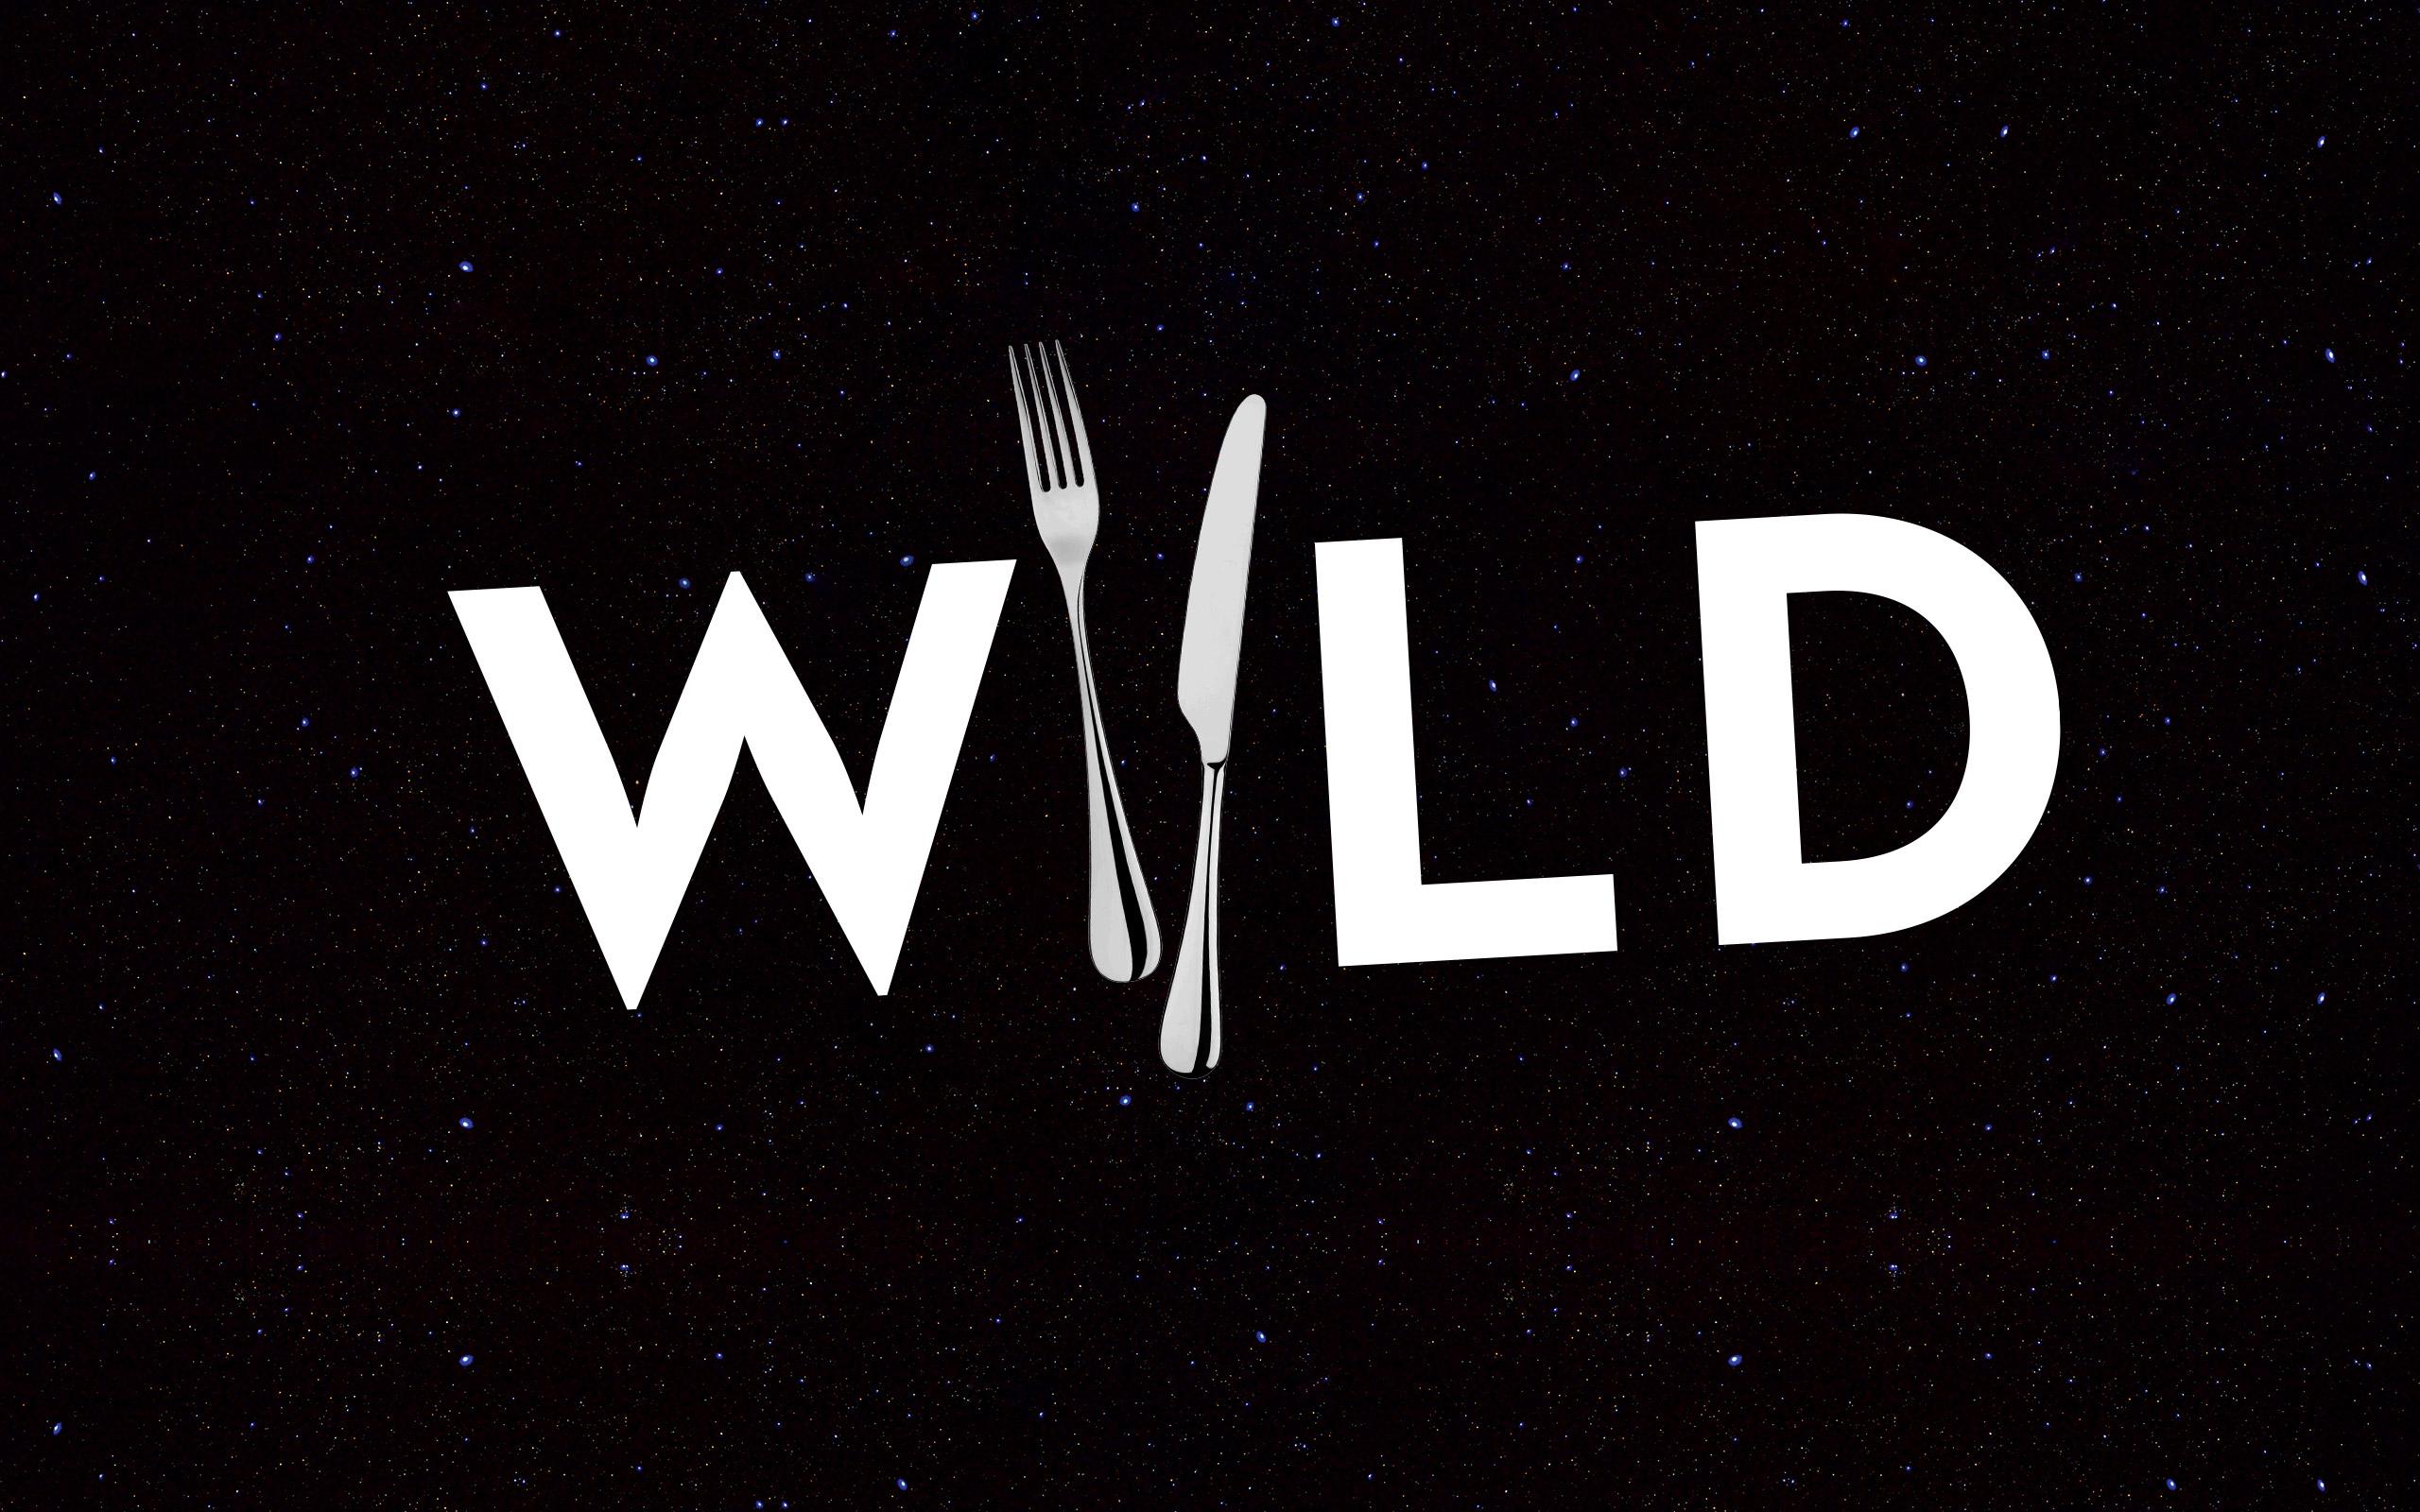 wild-web-img-vis-a-vis